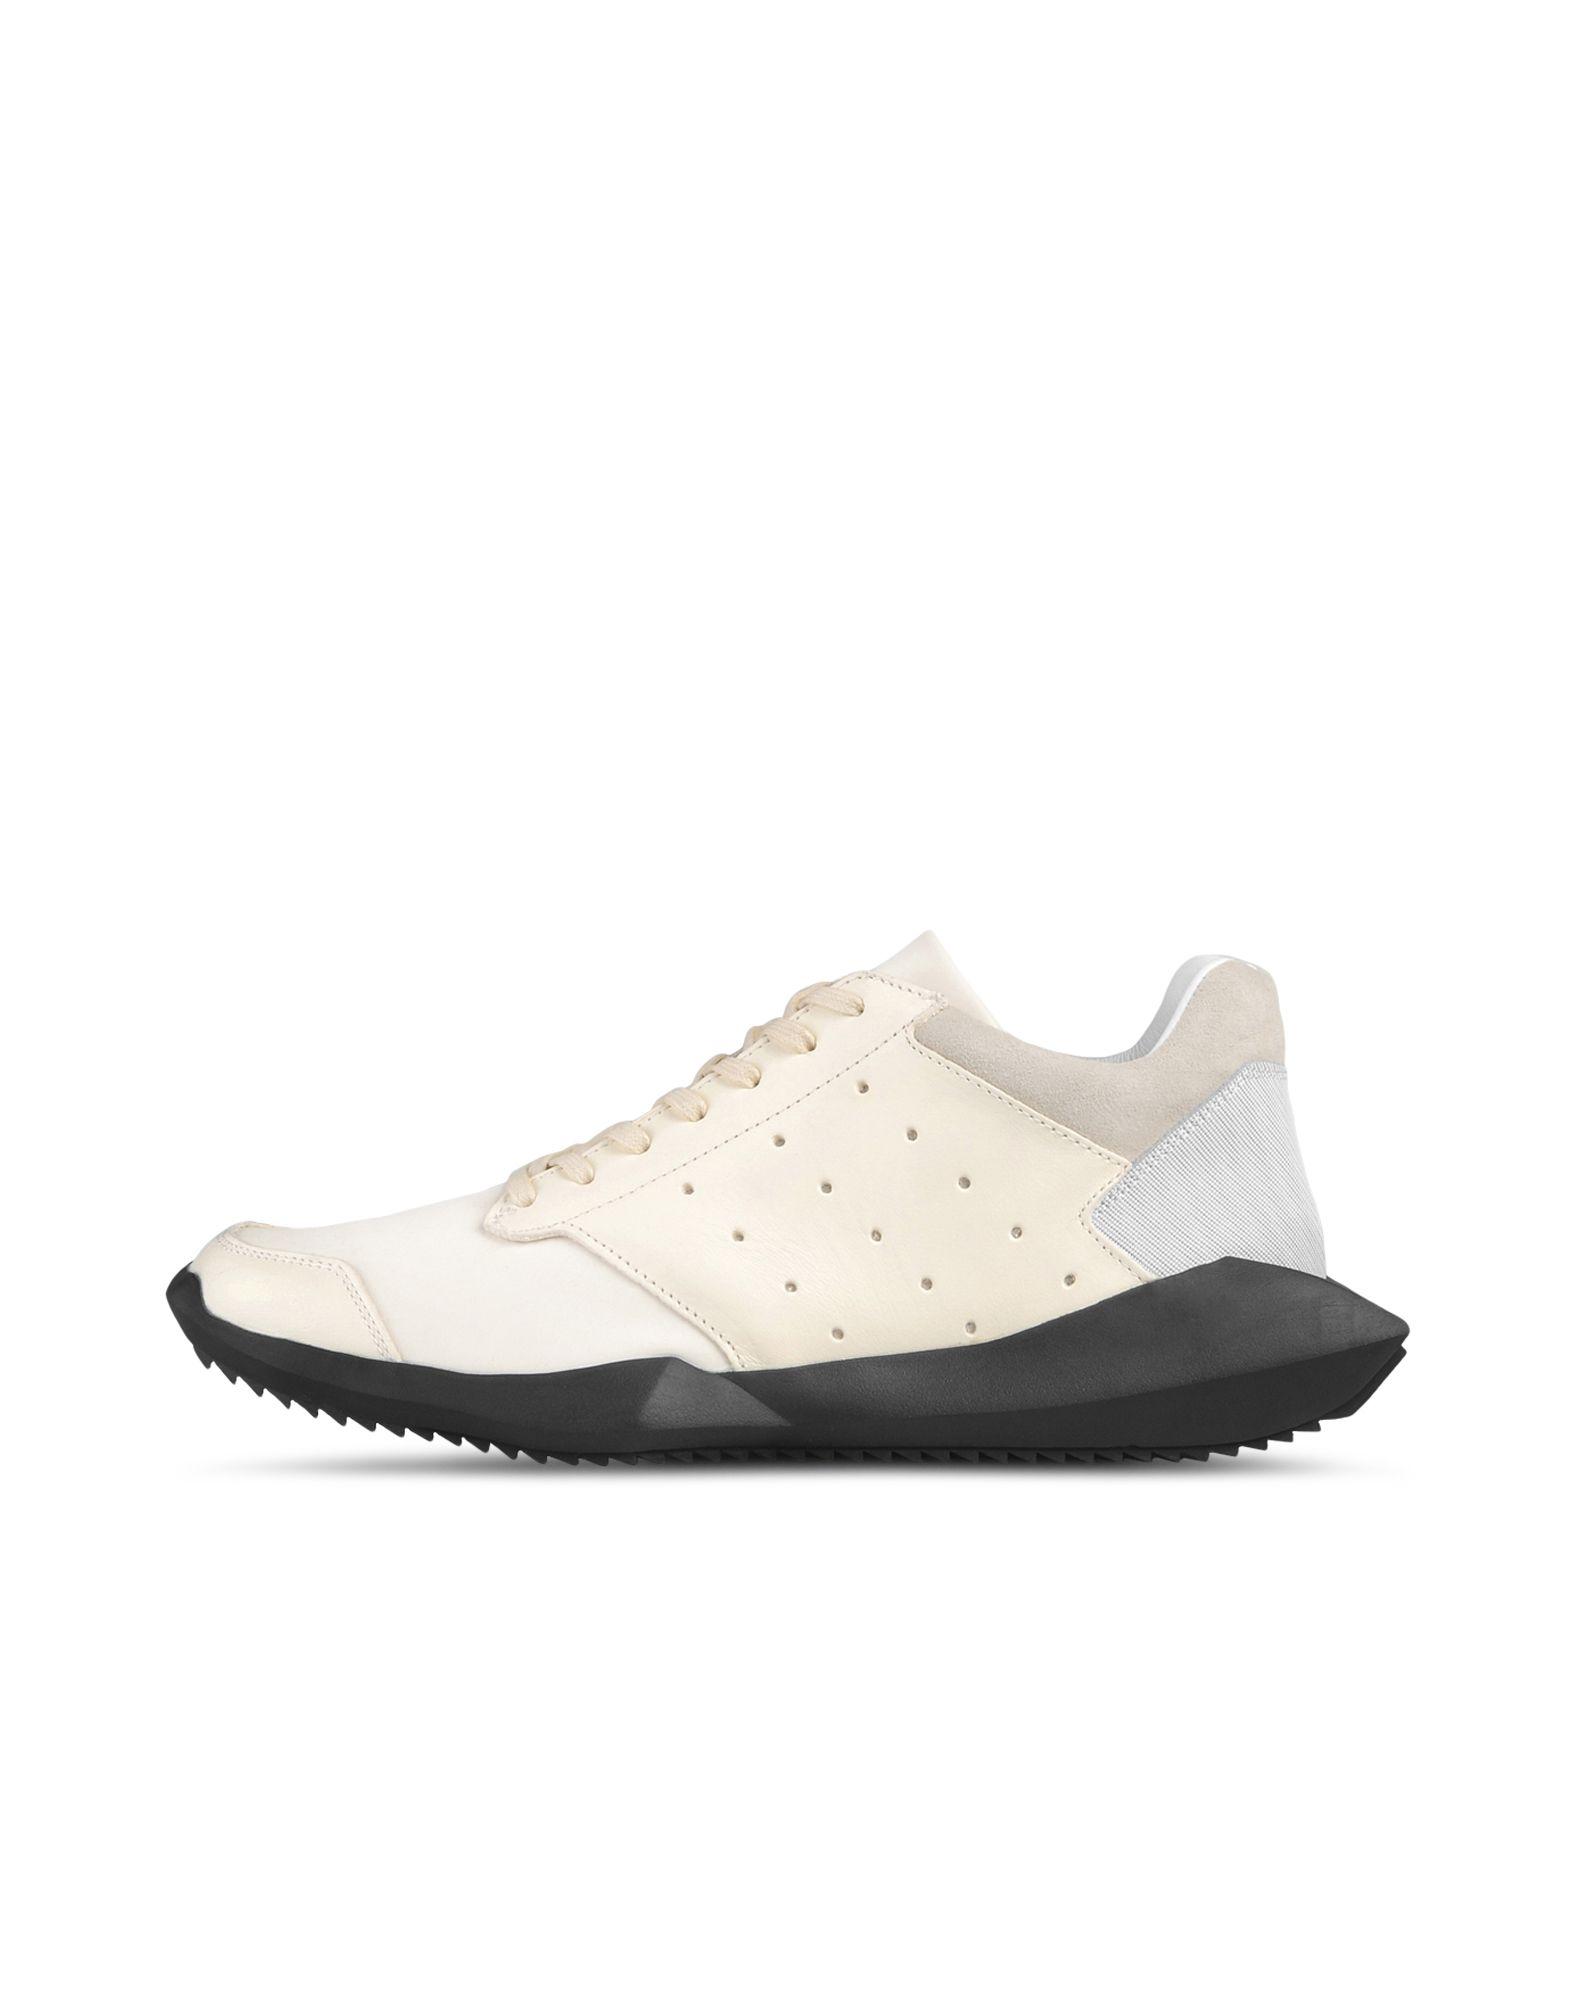 e5dc0f68fa80e6 ... RICK OWENS Rick Owens Tech Runner Sneakers E f ...